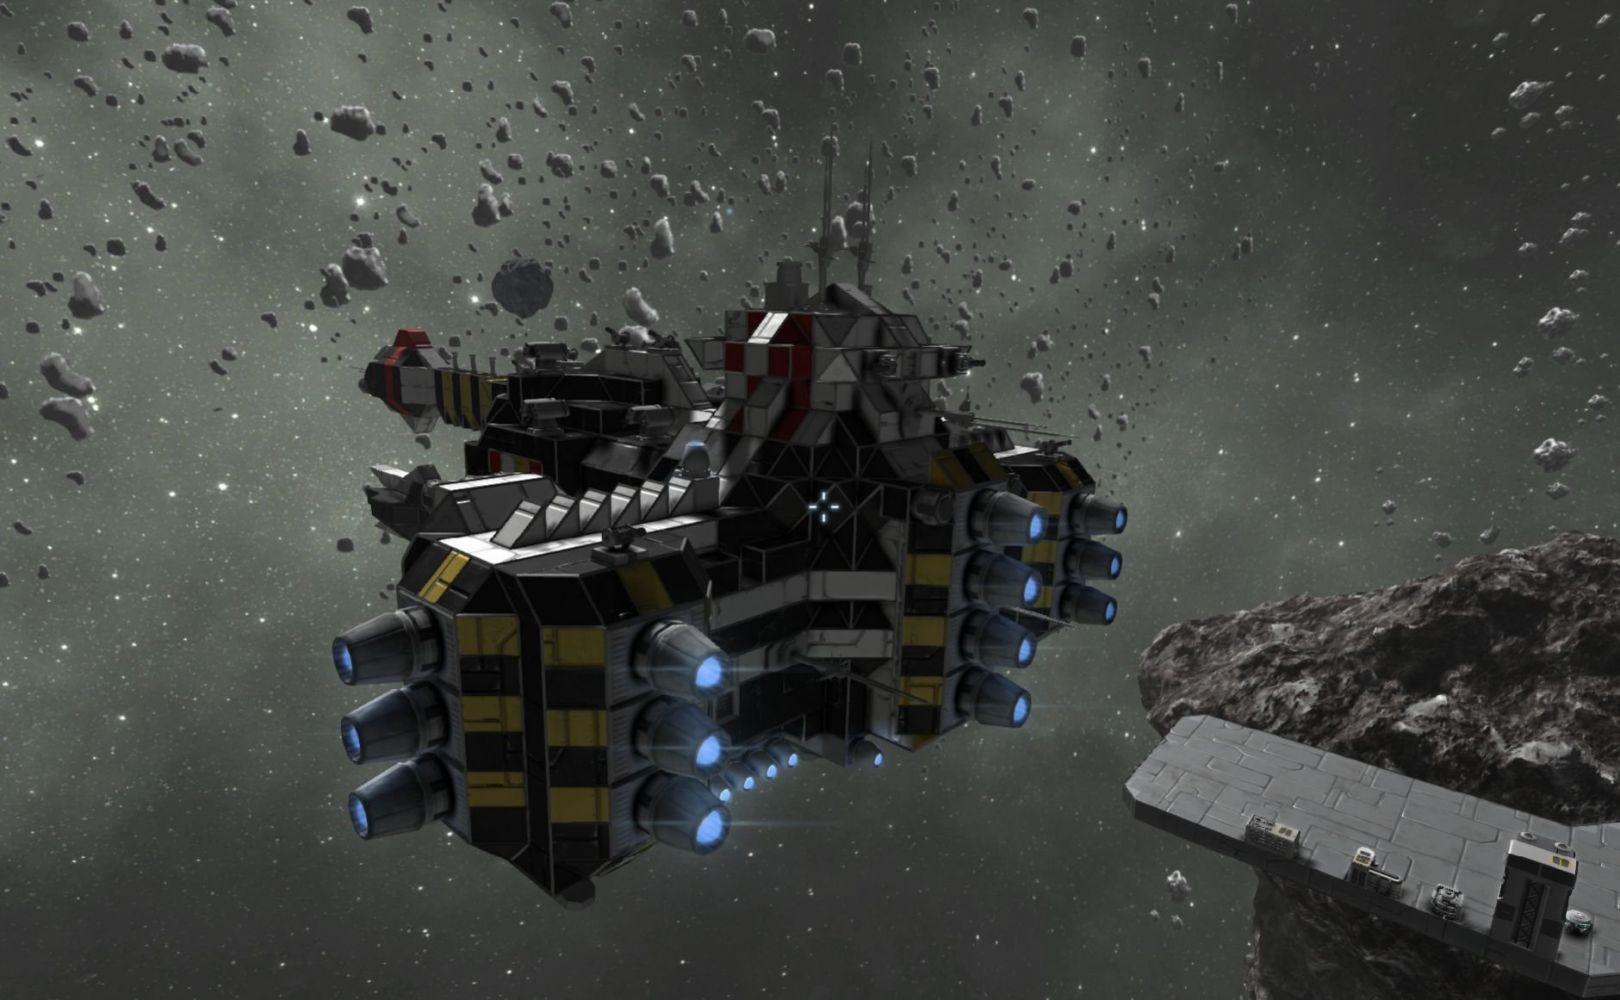 science fiction space sandbox - HD1620×1000